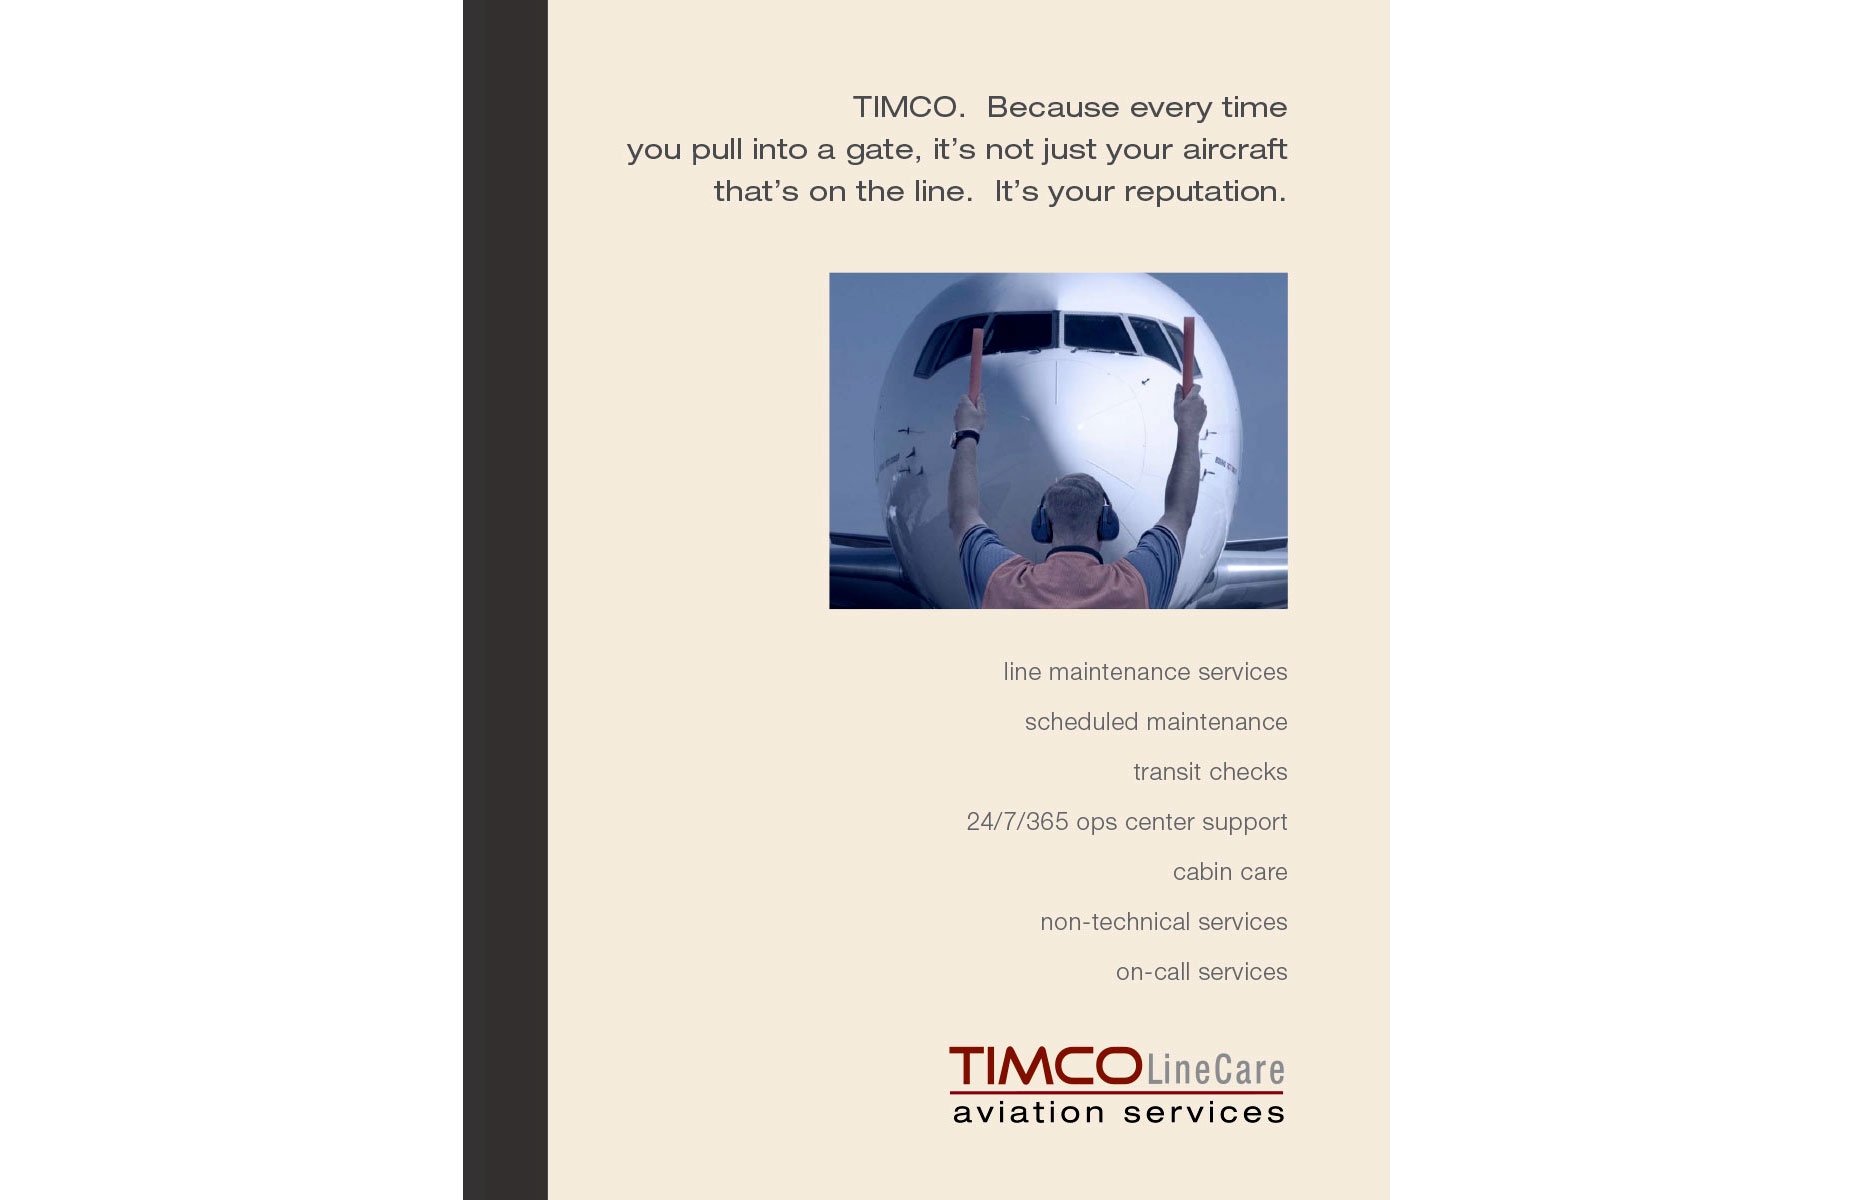 TIMCO_LC1